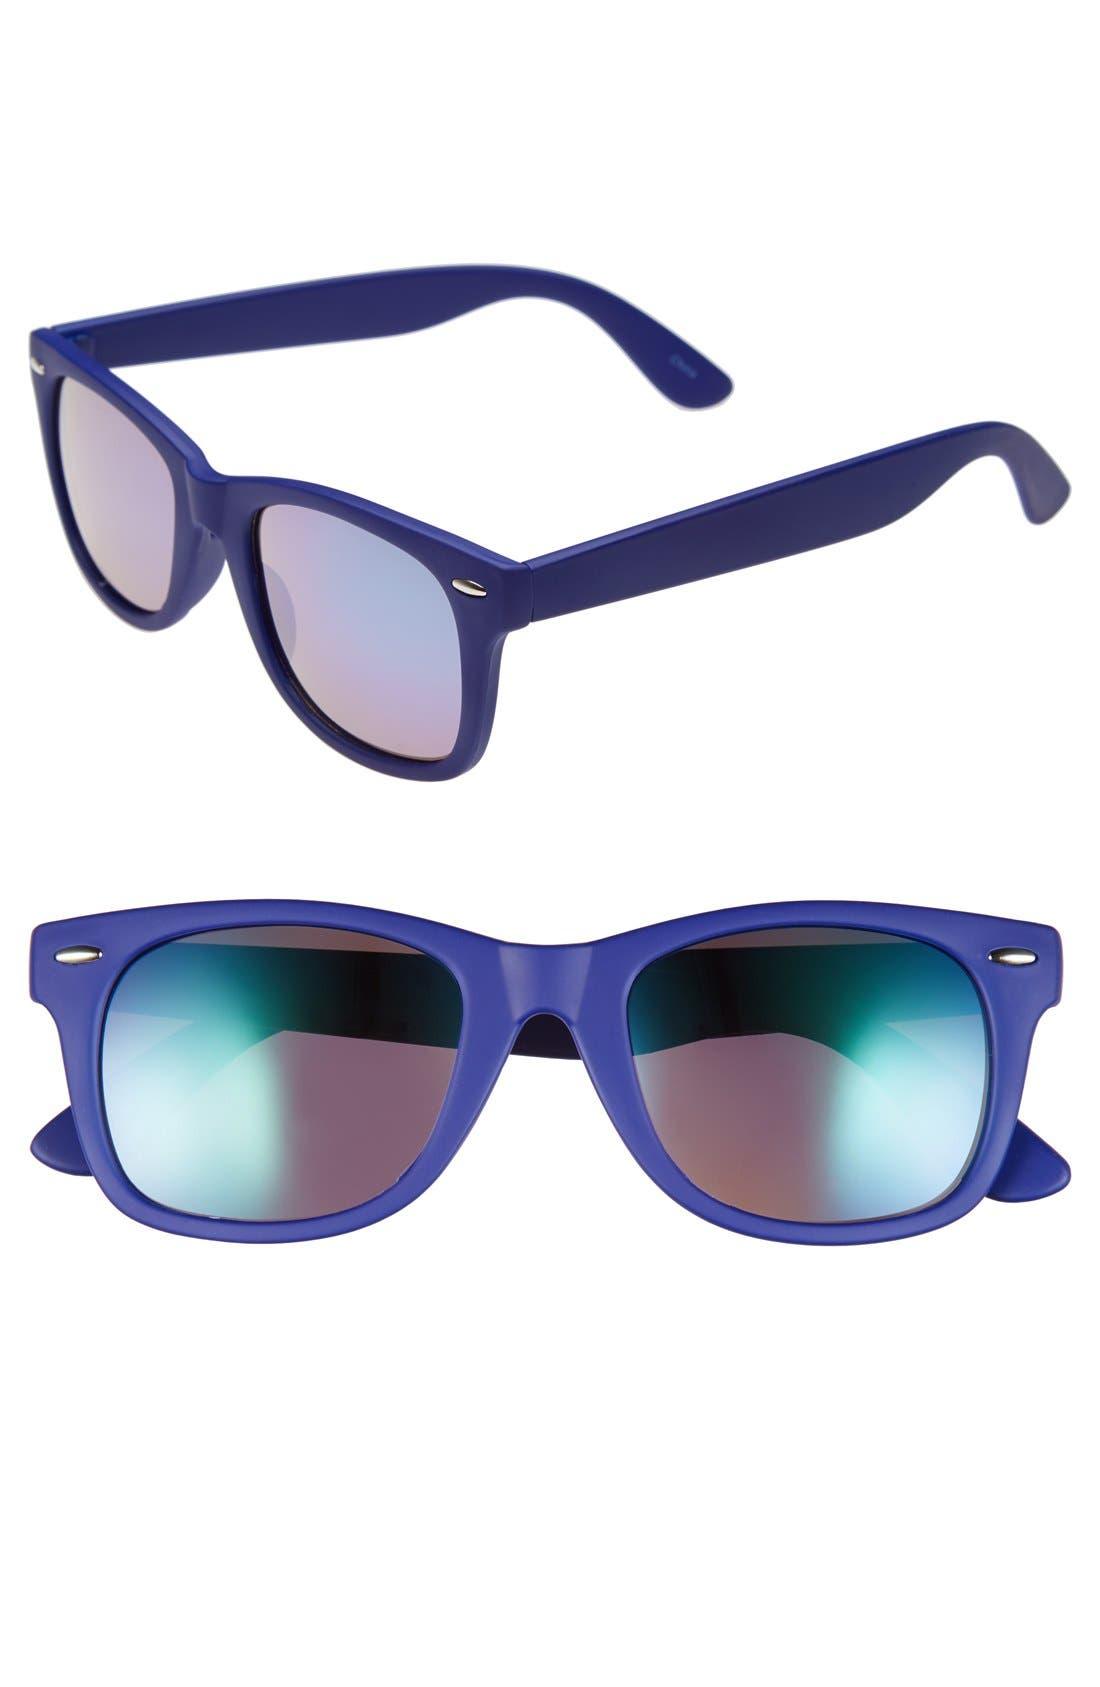 Main Image - Icon Eyewear 50mm Retro Sunglasses